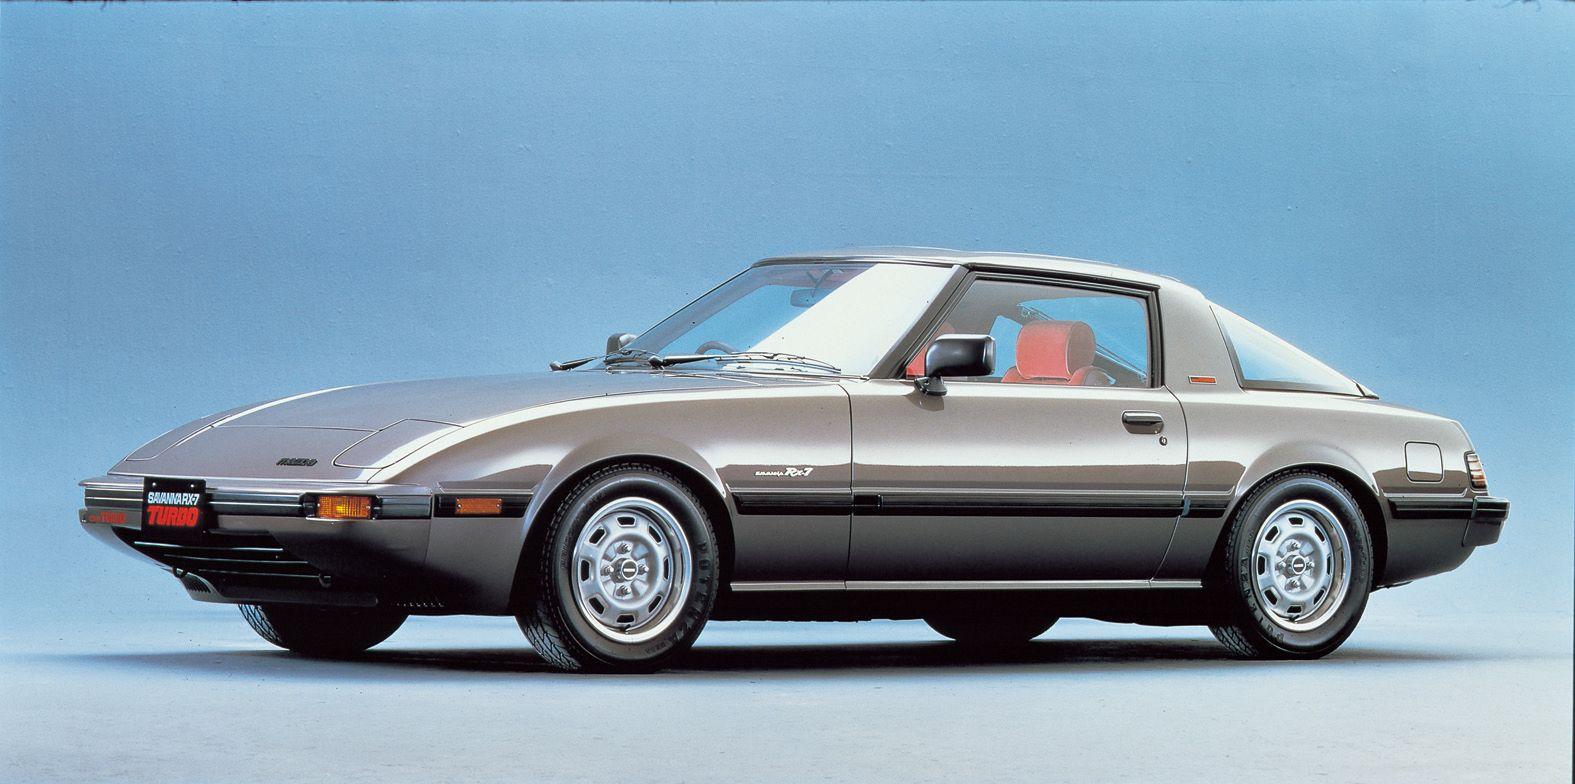 Mazda RX-7 Savanna Turbo 1981